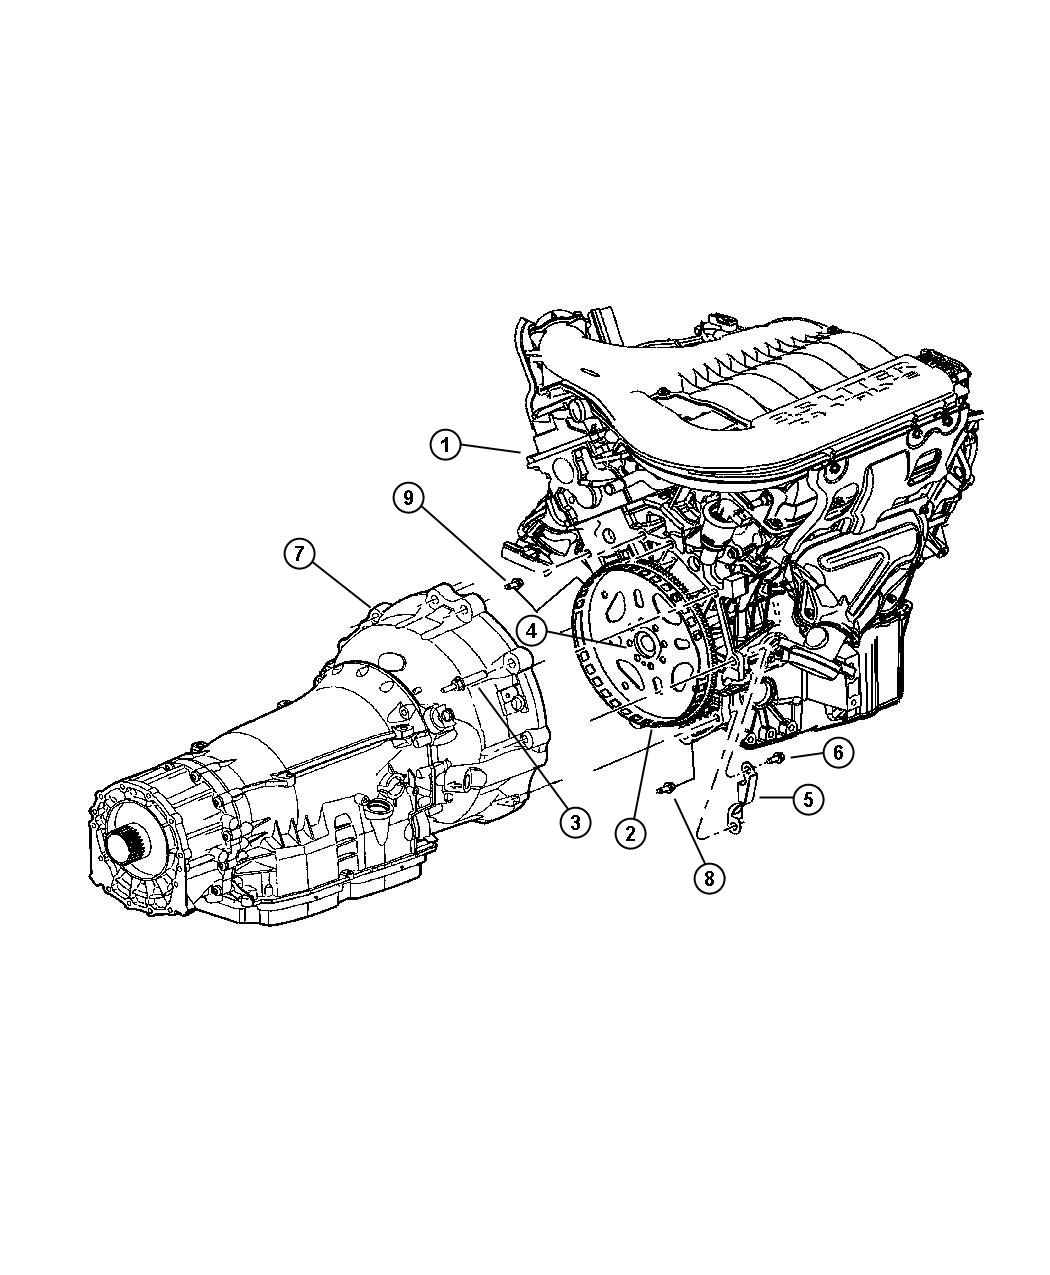 2010 dodge charger 3 5l engine diagram  u2022 wiring diagram